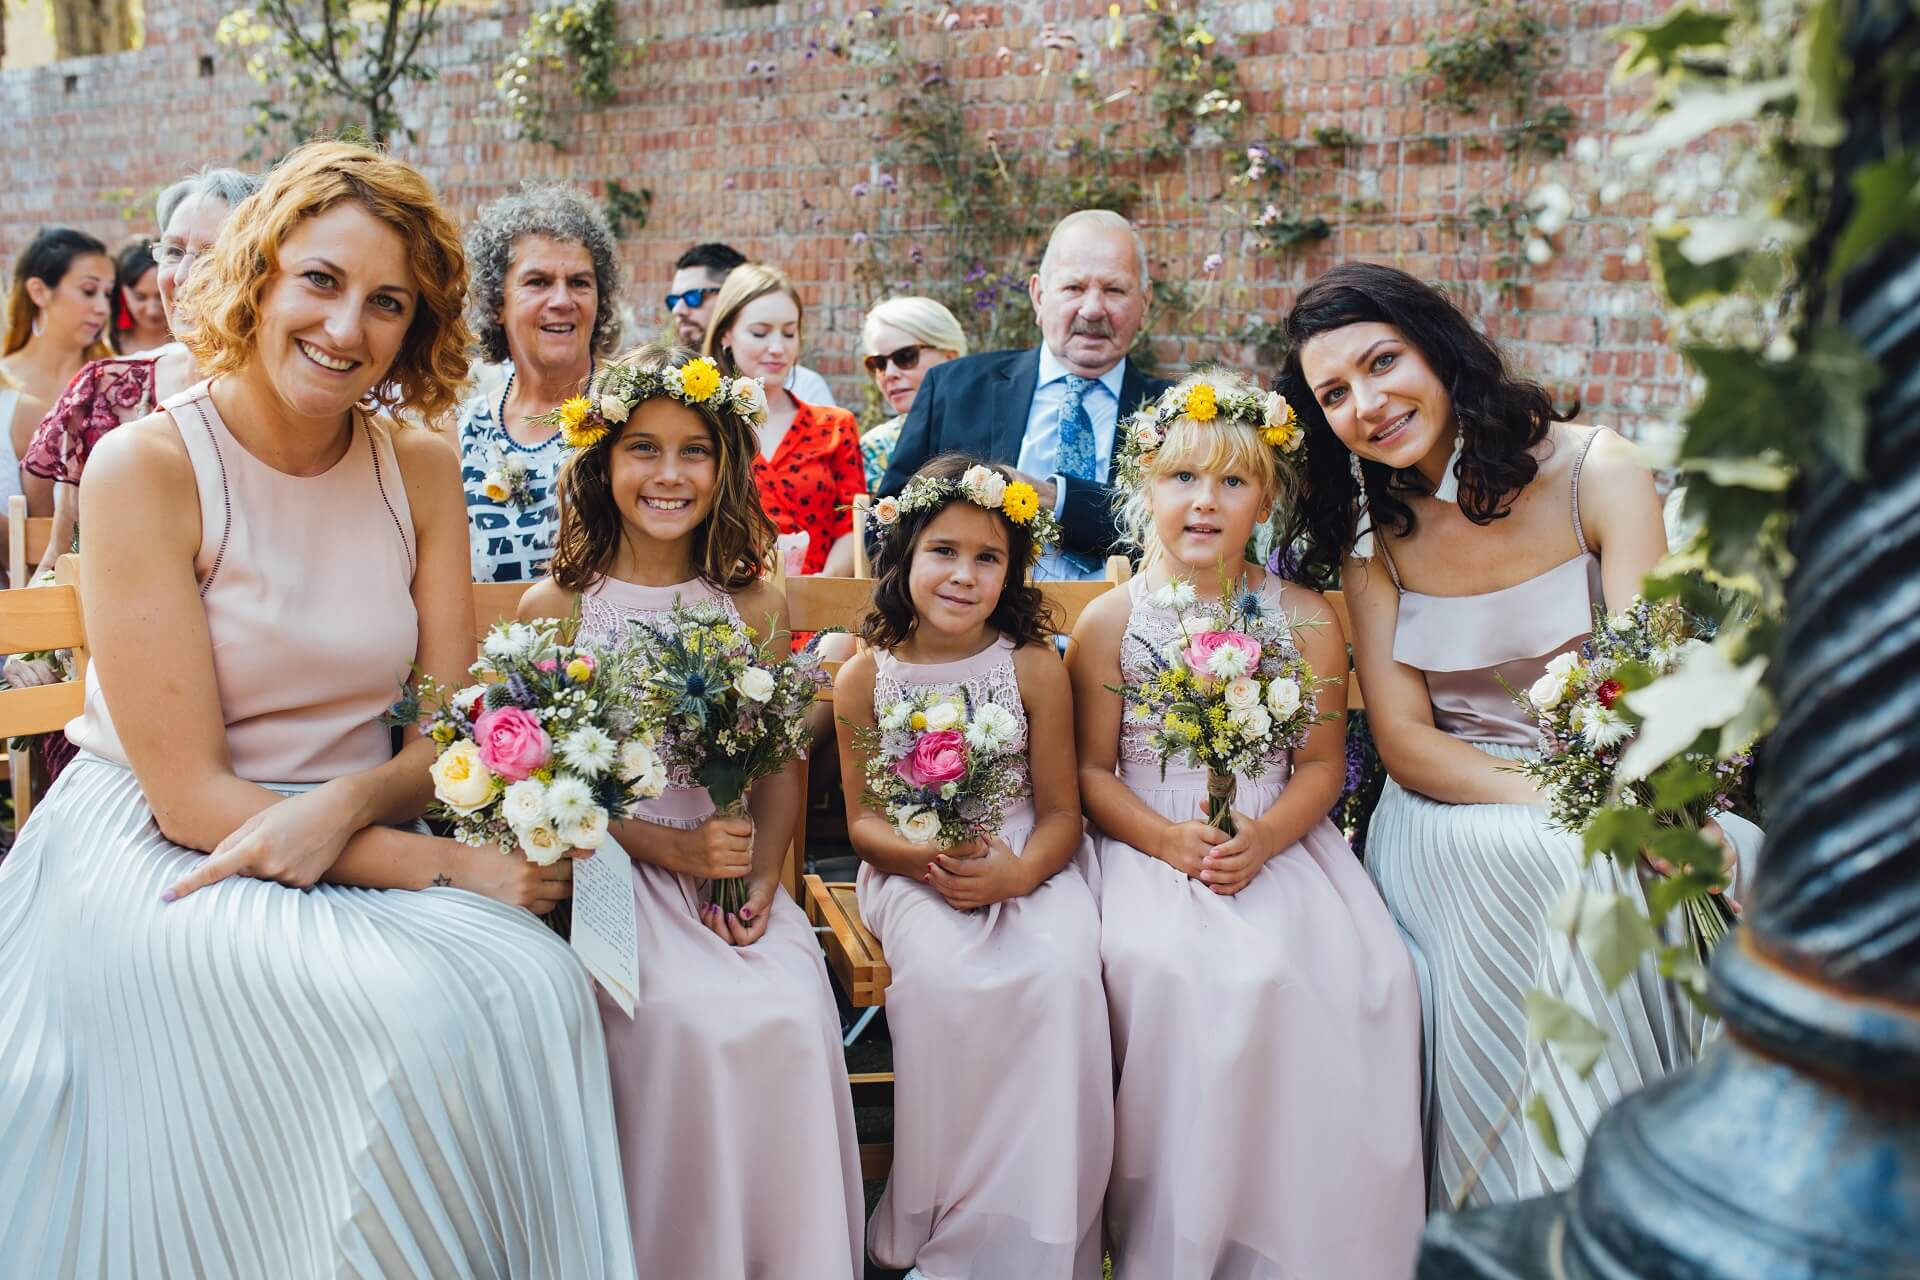 bridesmaid ,bouquet, flower, crowns